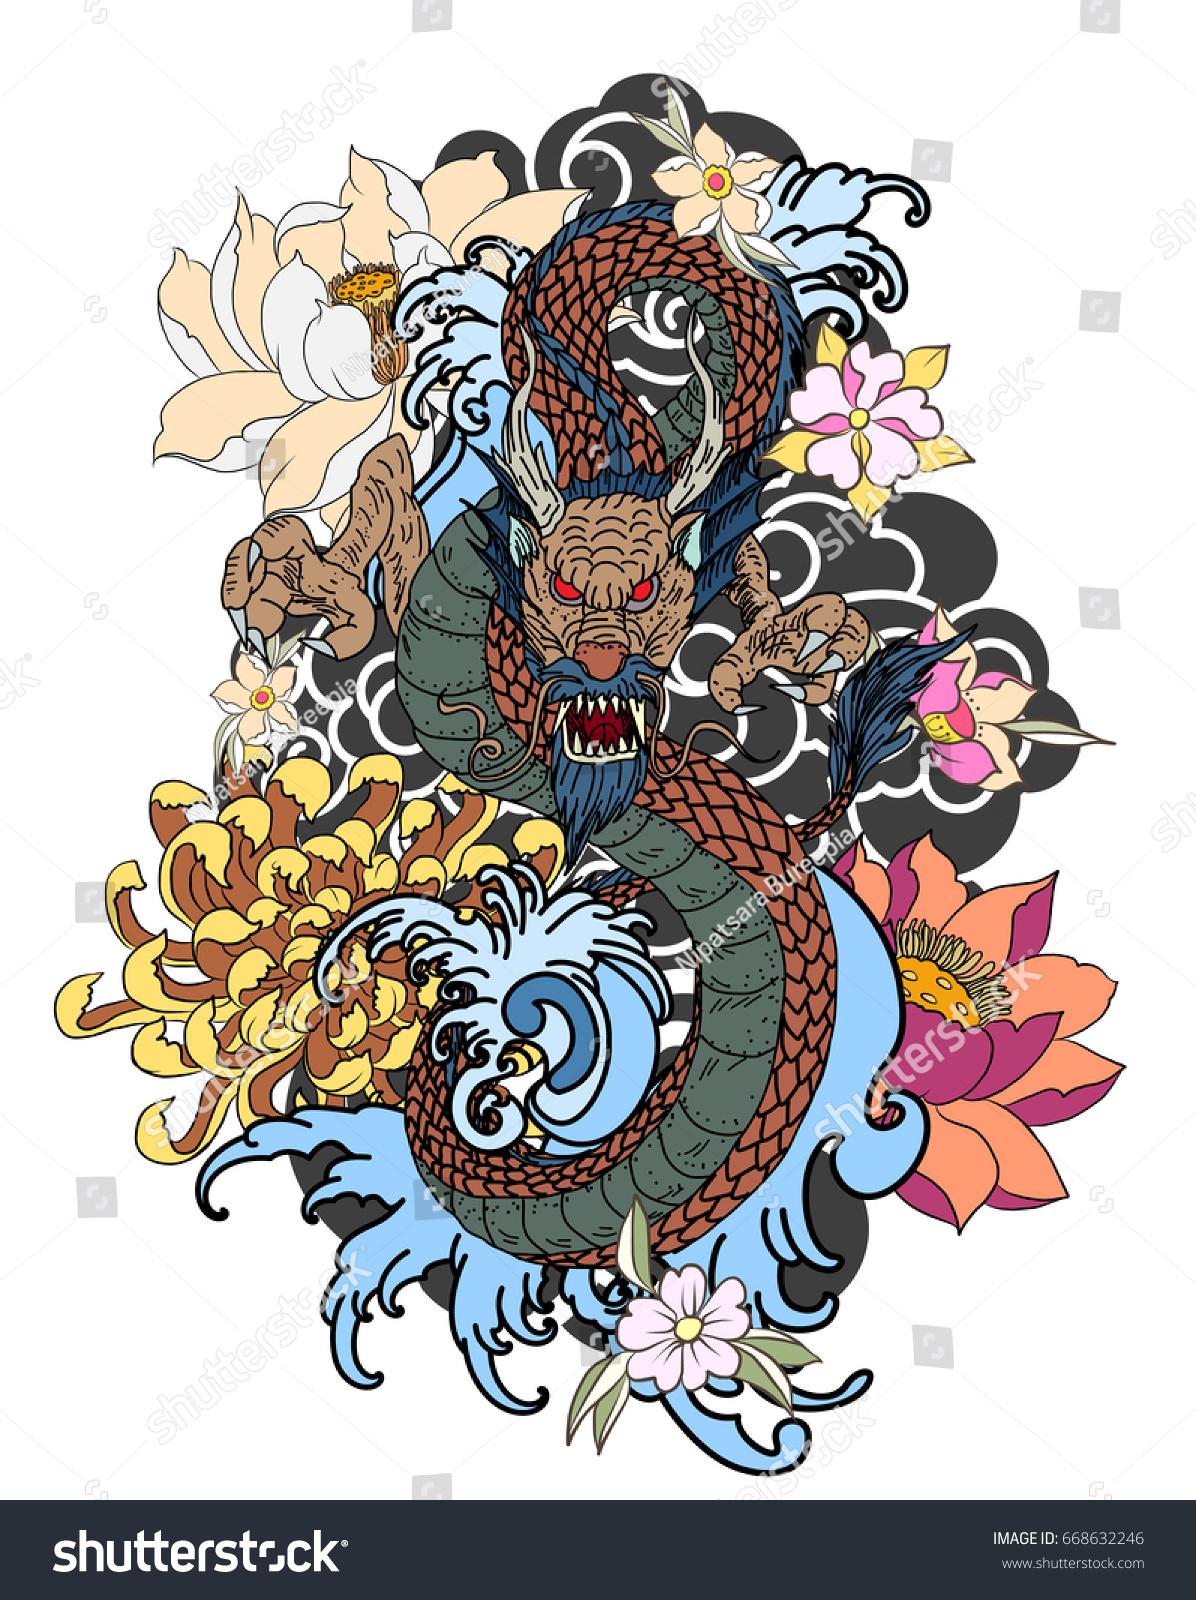 Tattoo design chinese dragon lotus sakura stock vector 668632246 tattoo design chinese dragon with lotus sakura and chrysanthemum flowerjapanese art izmirmasajfo